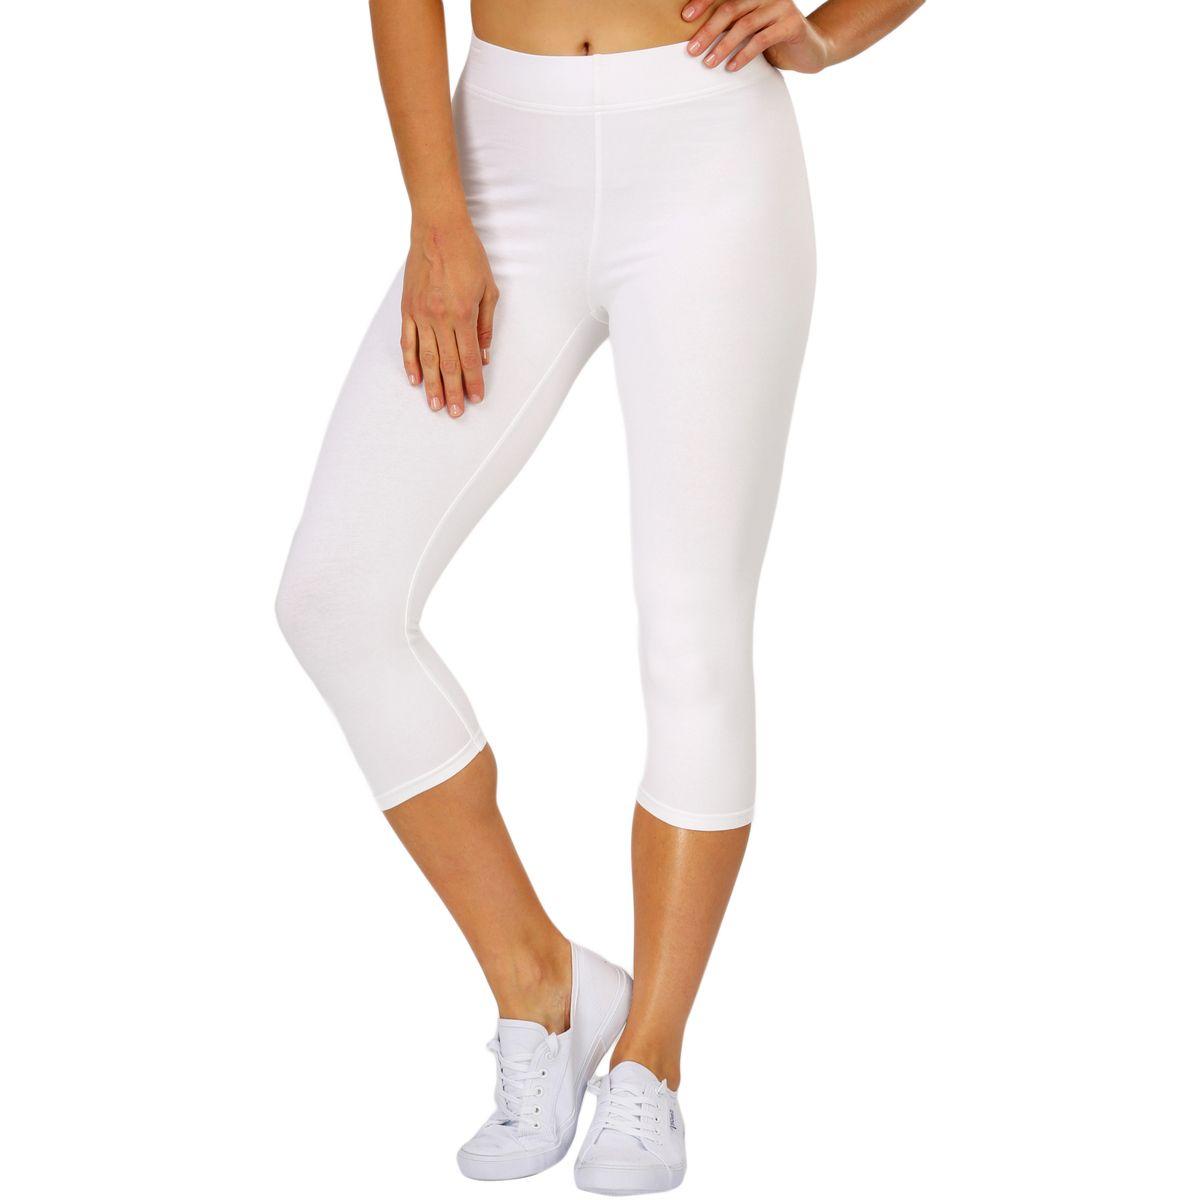 B Collection Women S Crop Legging White Big W Leggings Are Not Pants Cropped Leggings Pants For Women